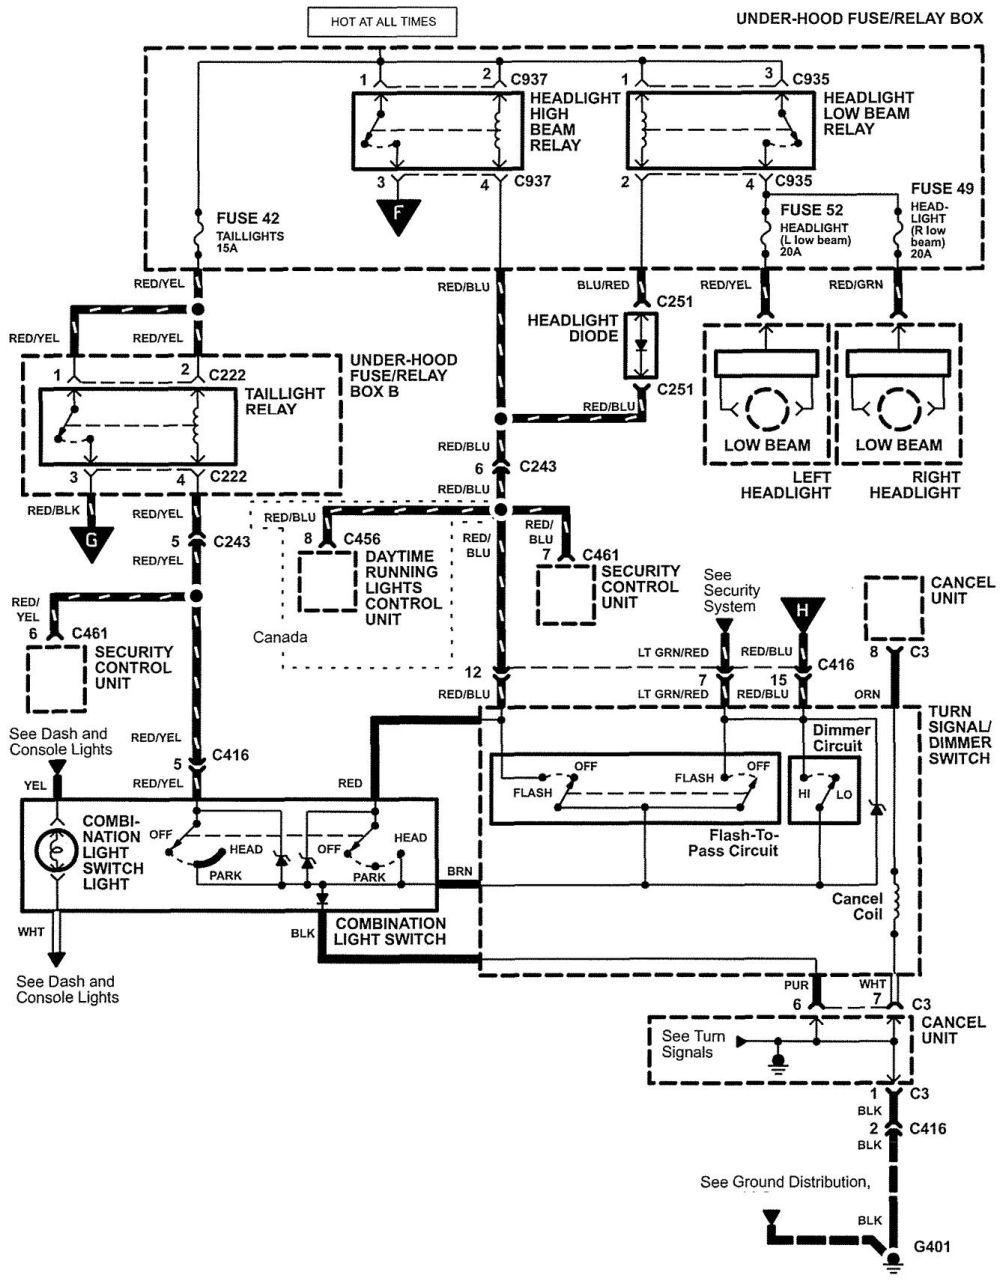 medium resolution of acura tail light wiring diagram yamaha dt3 wiring diagram acura integra headlight wiring diagram acura rsx headlight wiring diagram